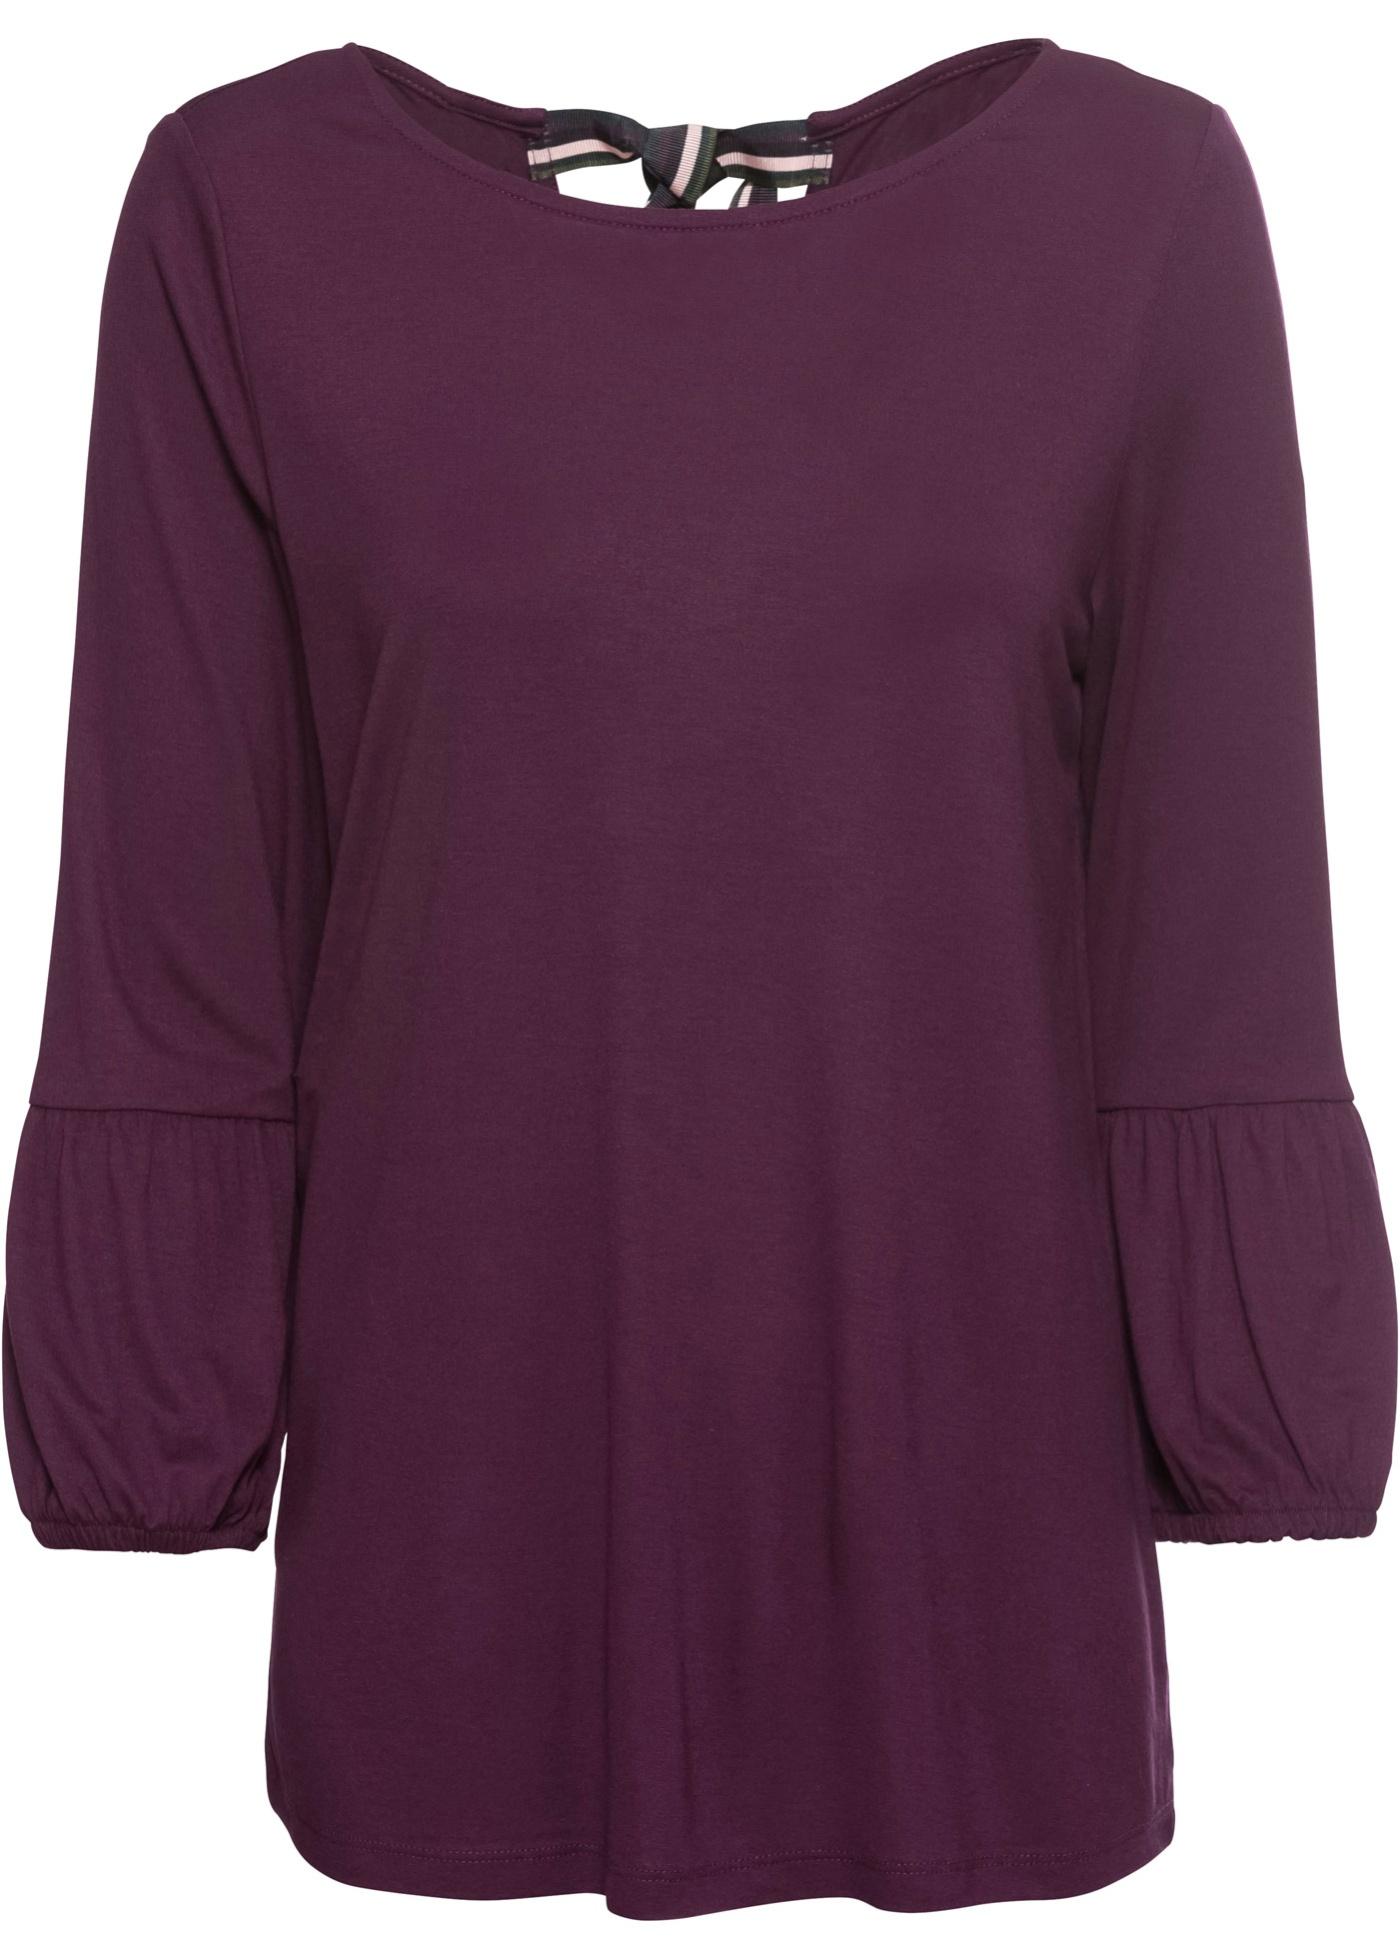 shirt 3 Femme Bodyflirt Violet BonprixT 4 Pour Manches mvNynwO80